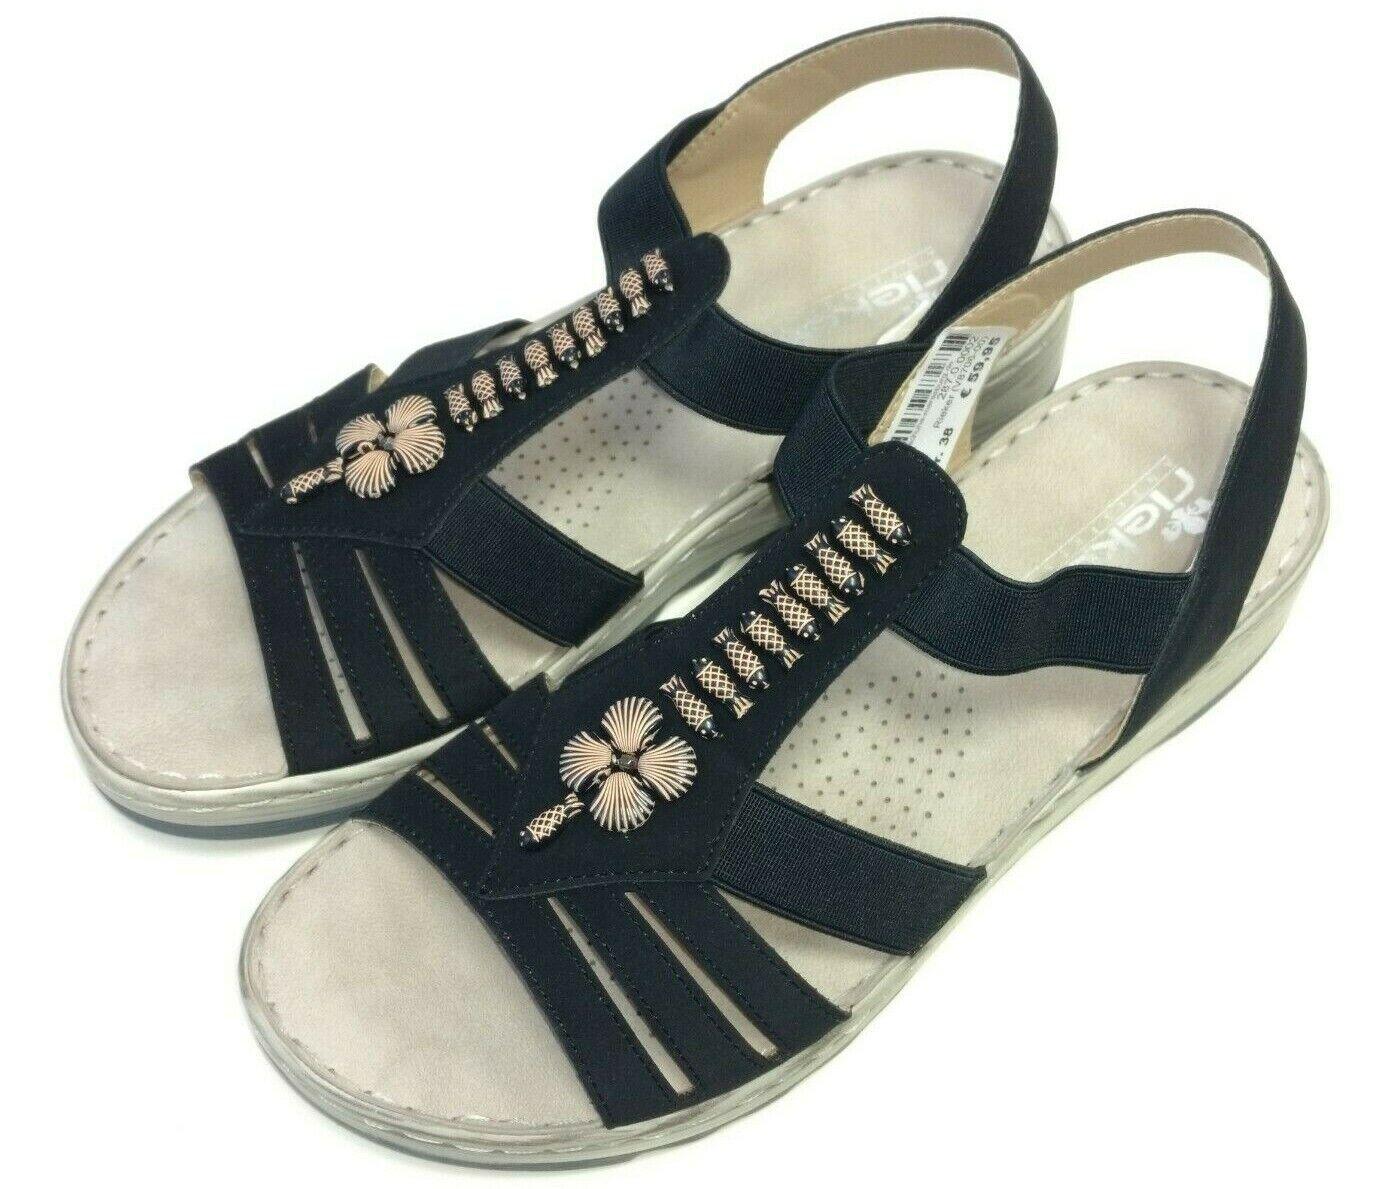 Rieker Antistress chaussures femmes Sandale Sandale mules v8706-00 noir